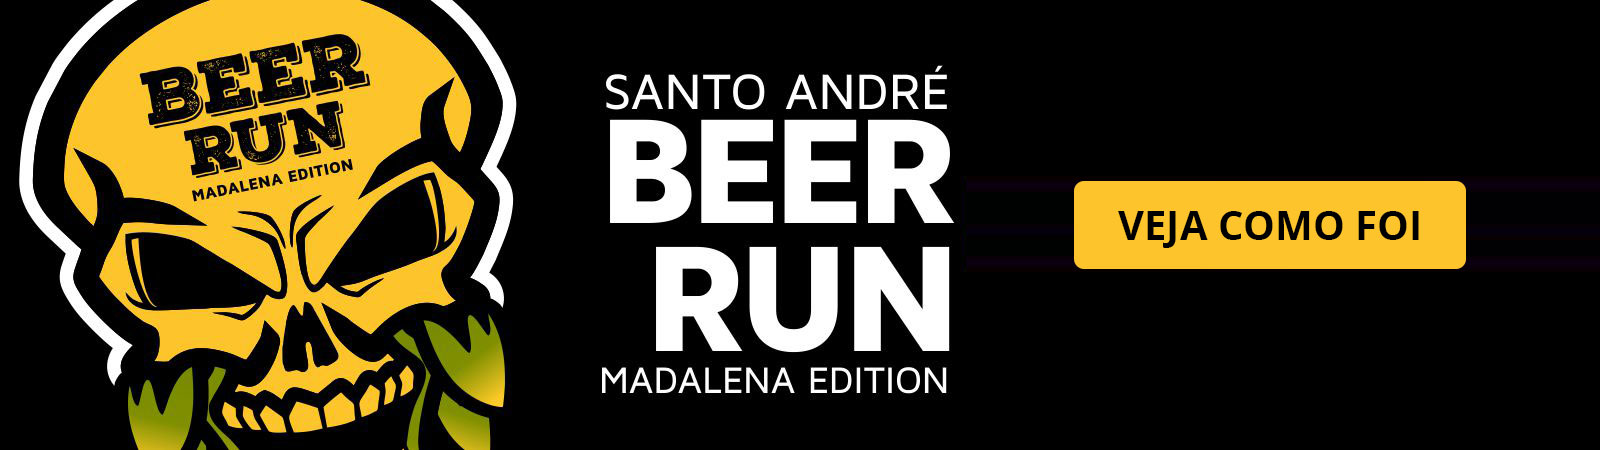 banner-madalena-edition-santo-andre-2019-como-foi